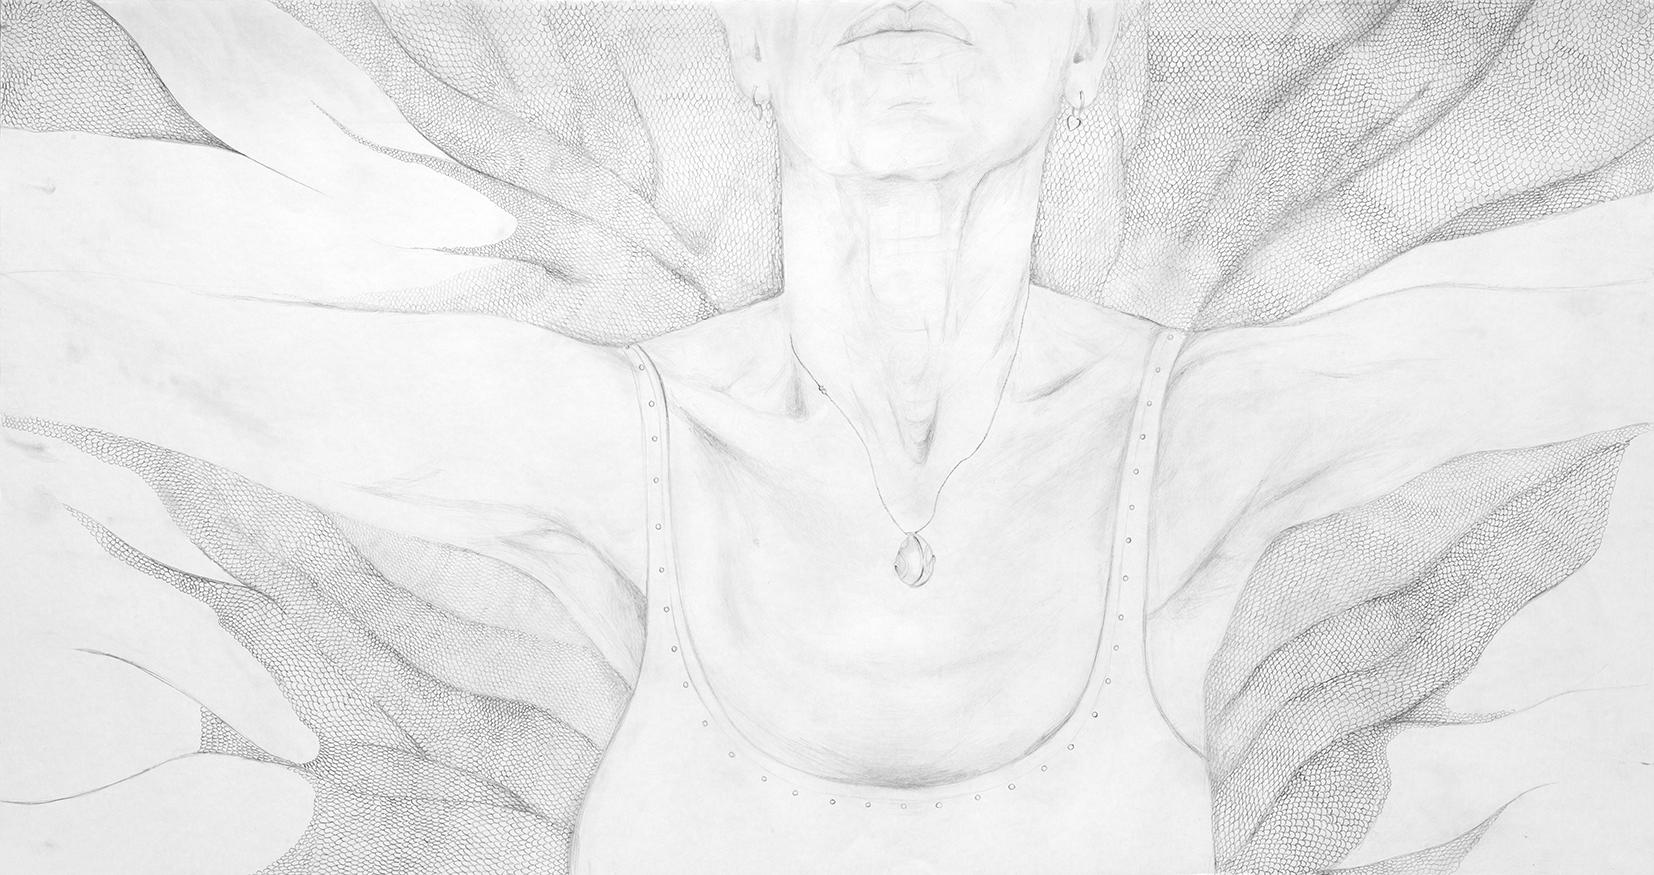 Under armored wings #4 By Nurit Barak kachtan